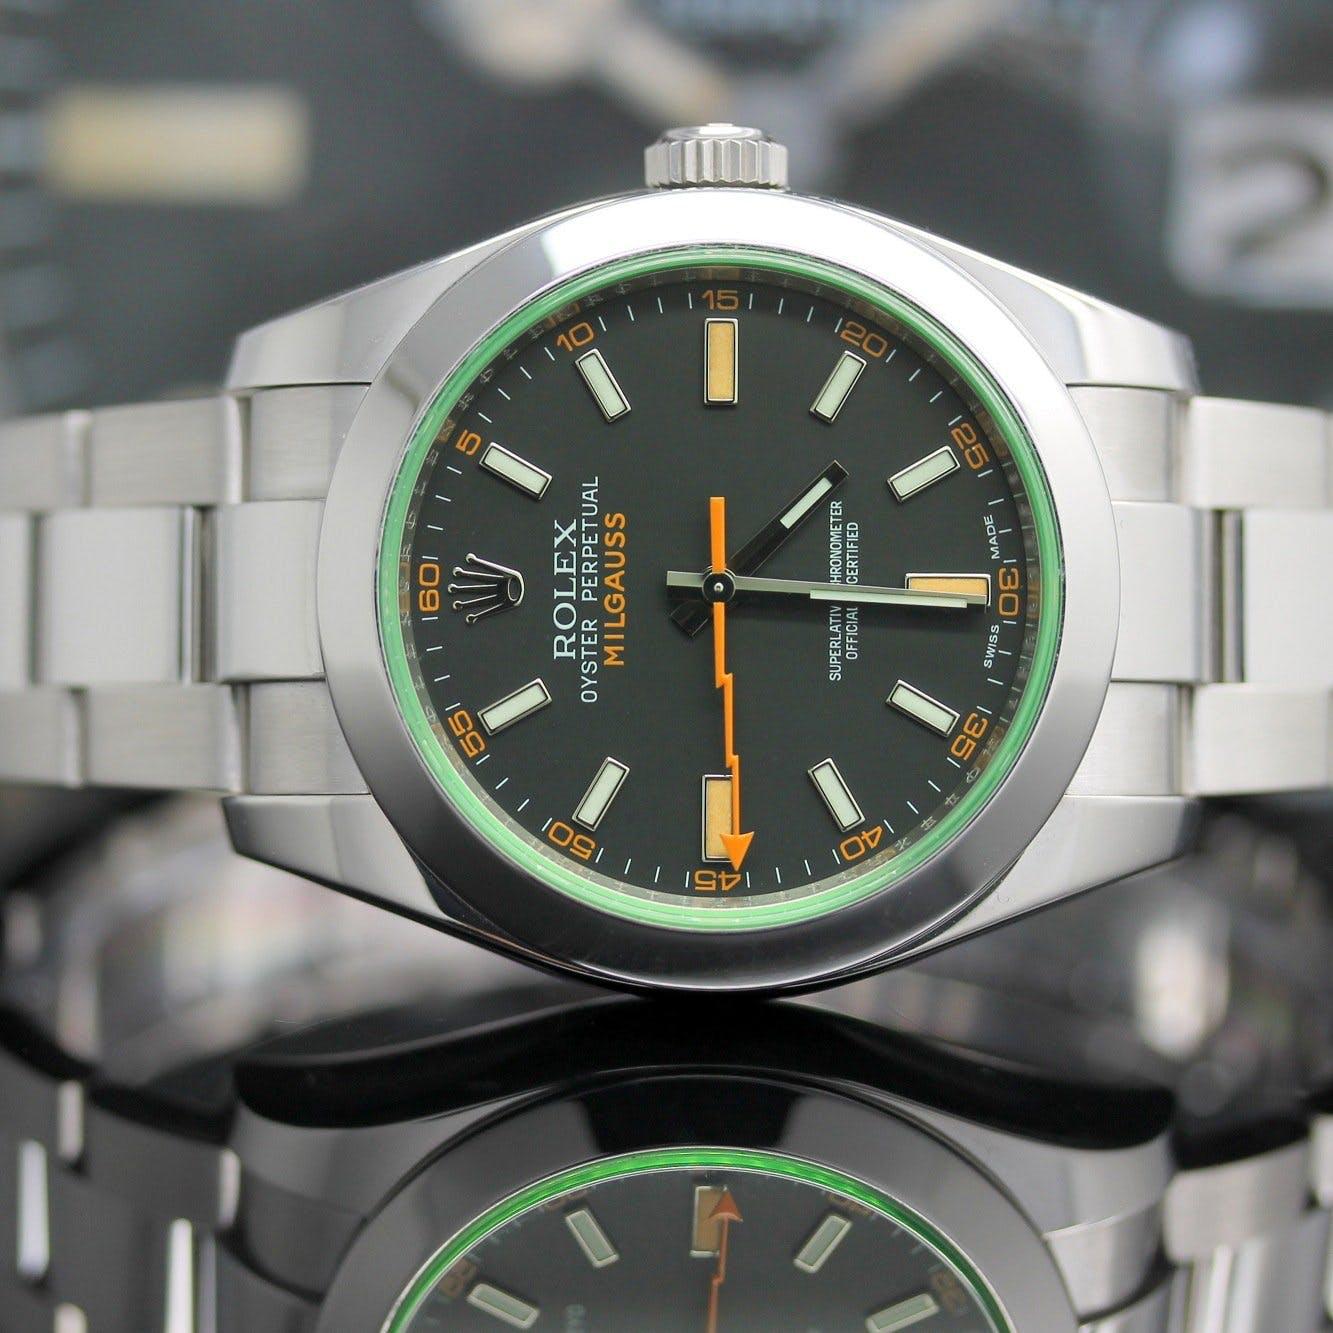 Rolex Milgauss ref. 116400GV